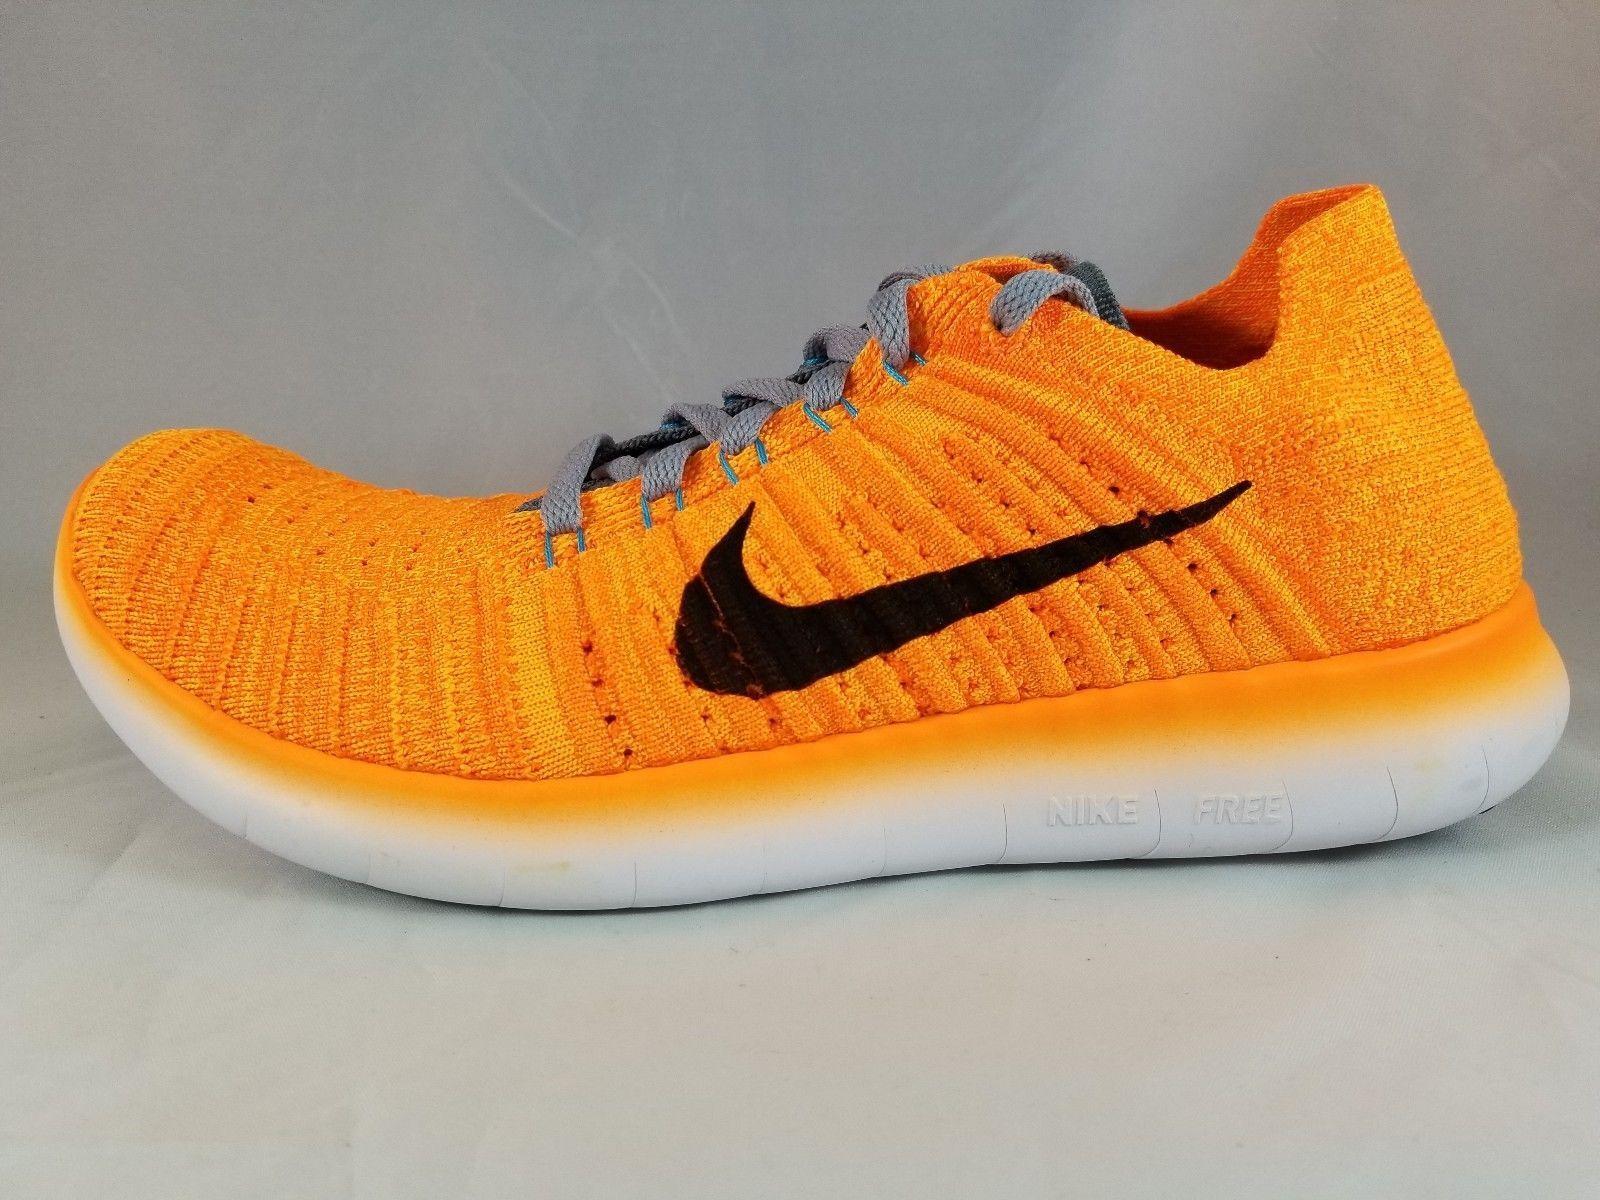 Nike Free RN Flyknit Men's Running shoes 831069 800 Size 11.5